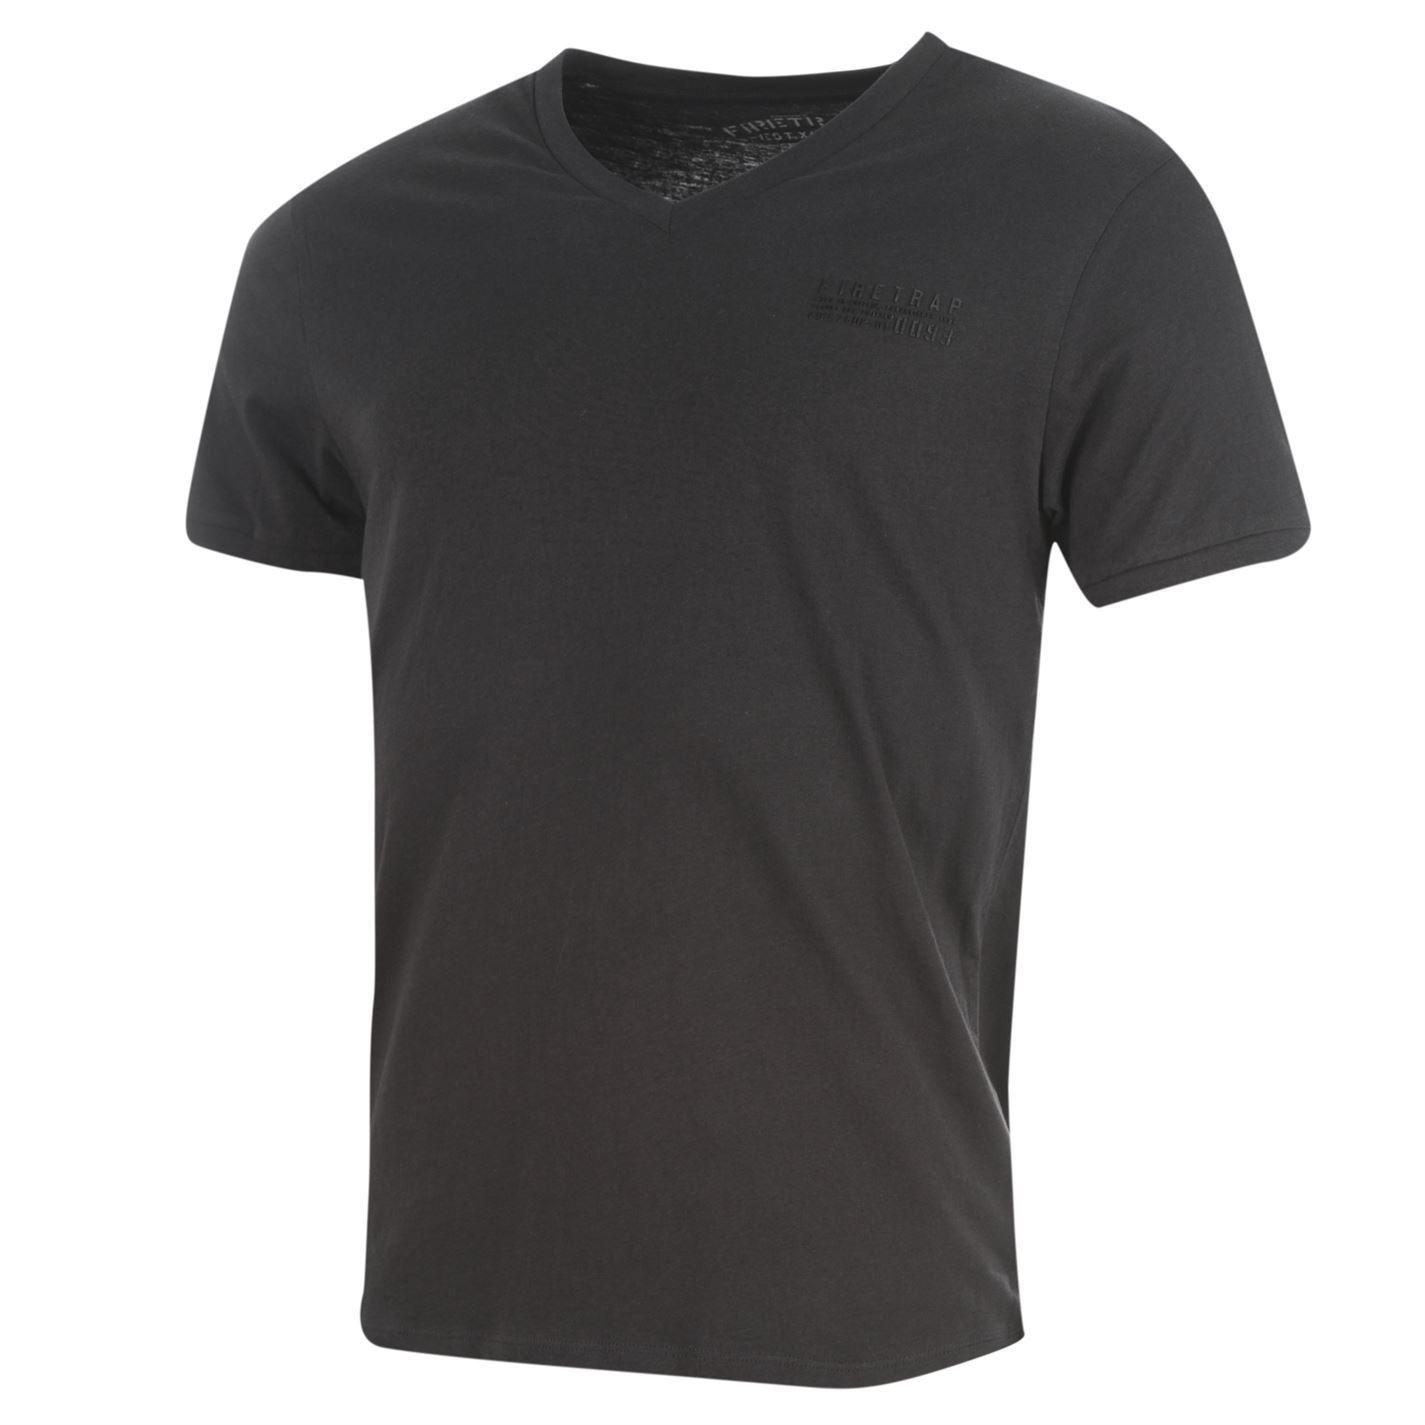 Firetrap-Path-T-Shirt-Mens-Navy-Top-Tee-Tshirt thumbnail 3